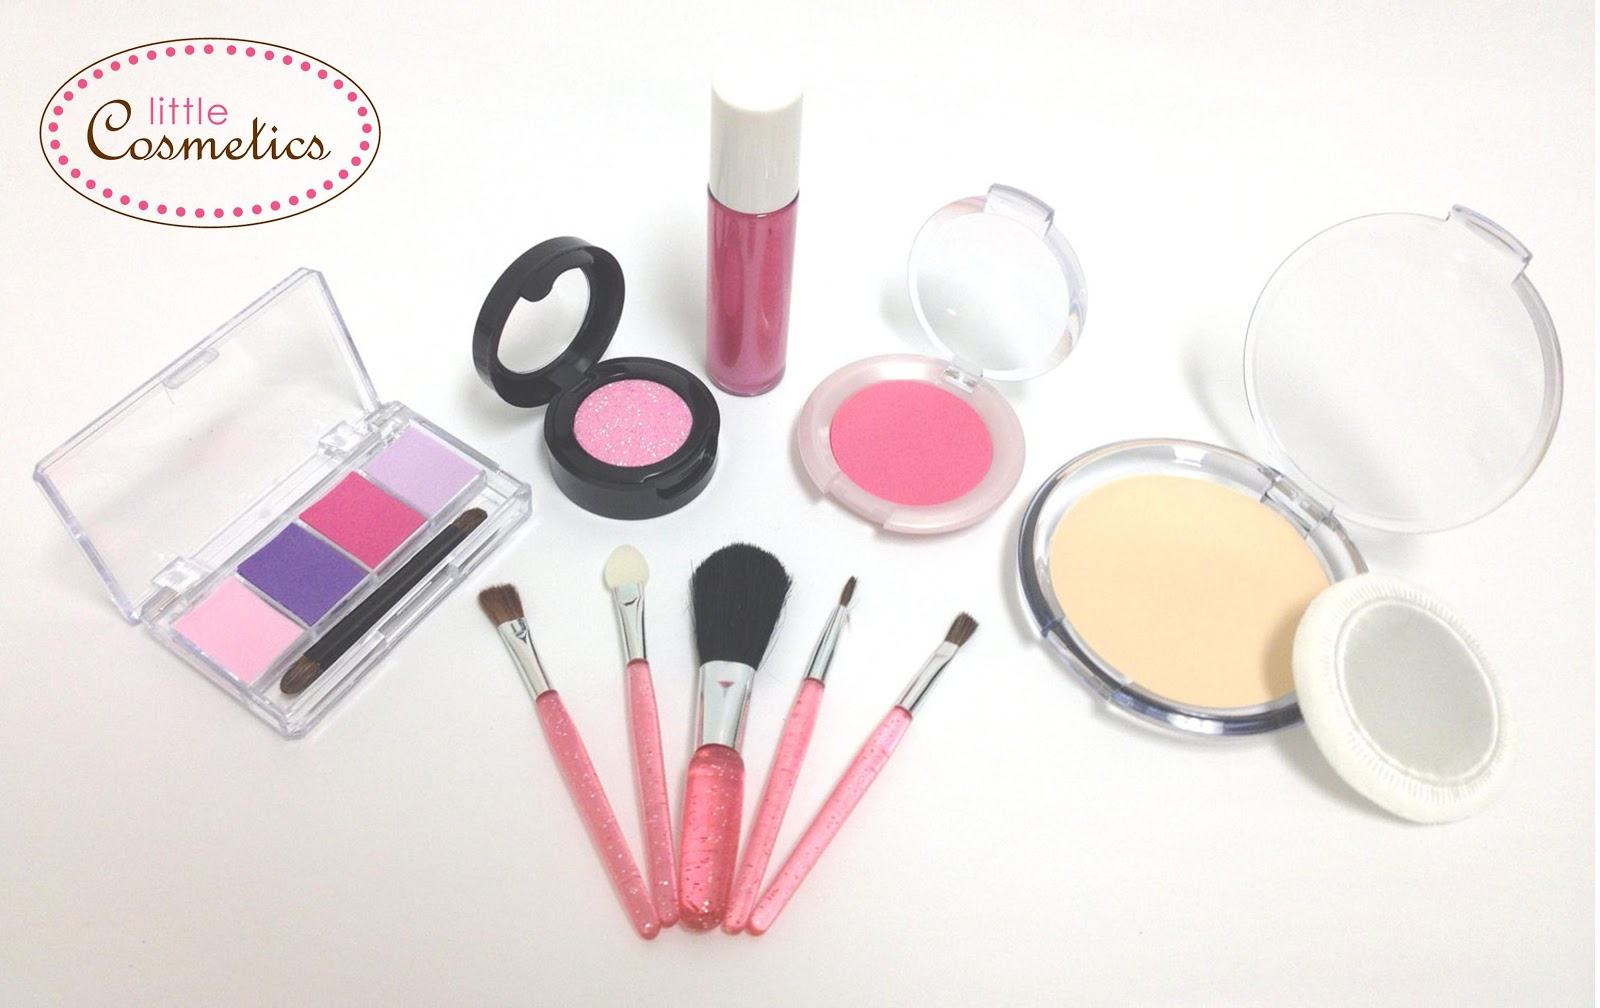 Saralee Deals Steals Giveaways Little Cosmetics